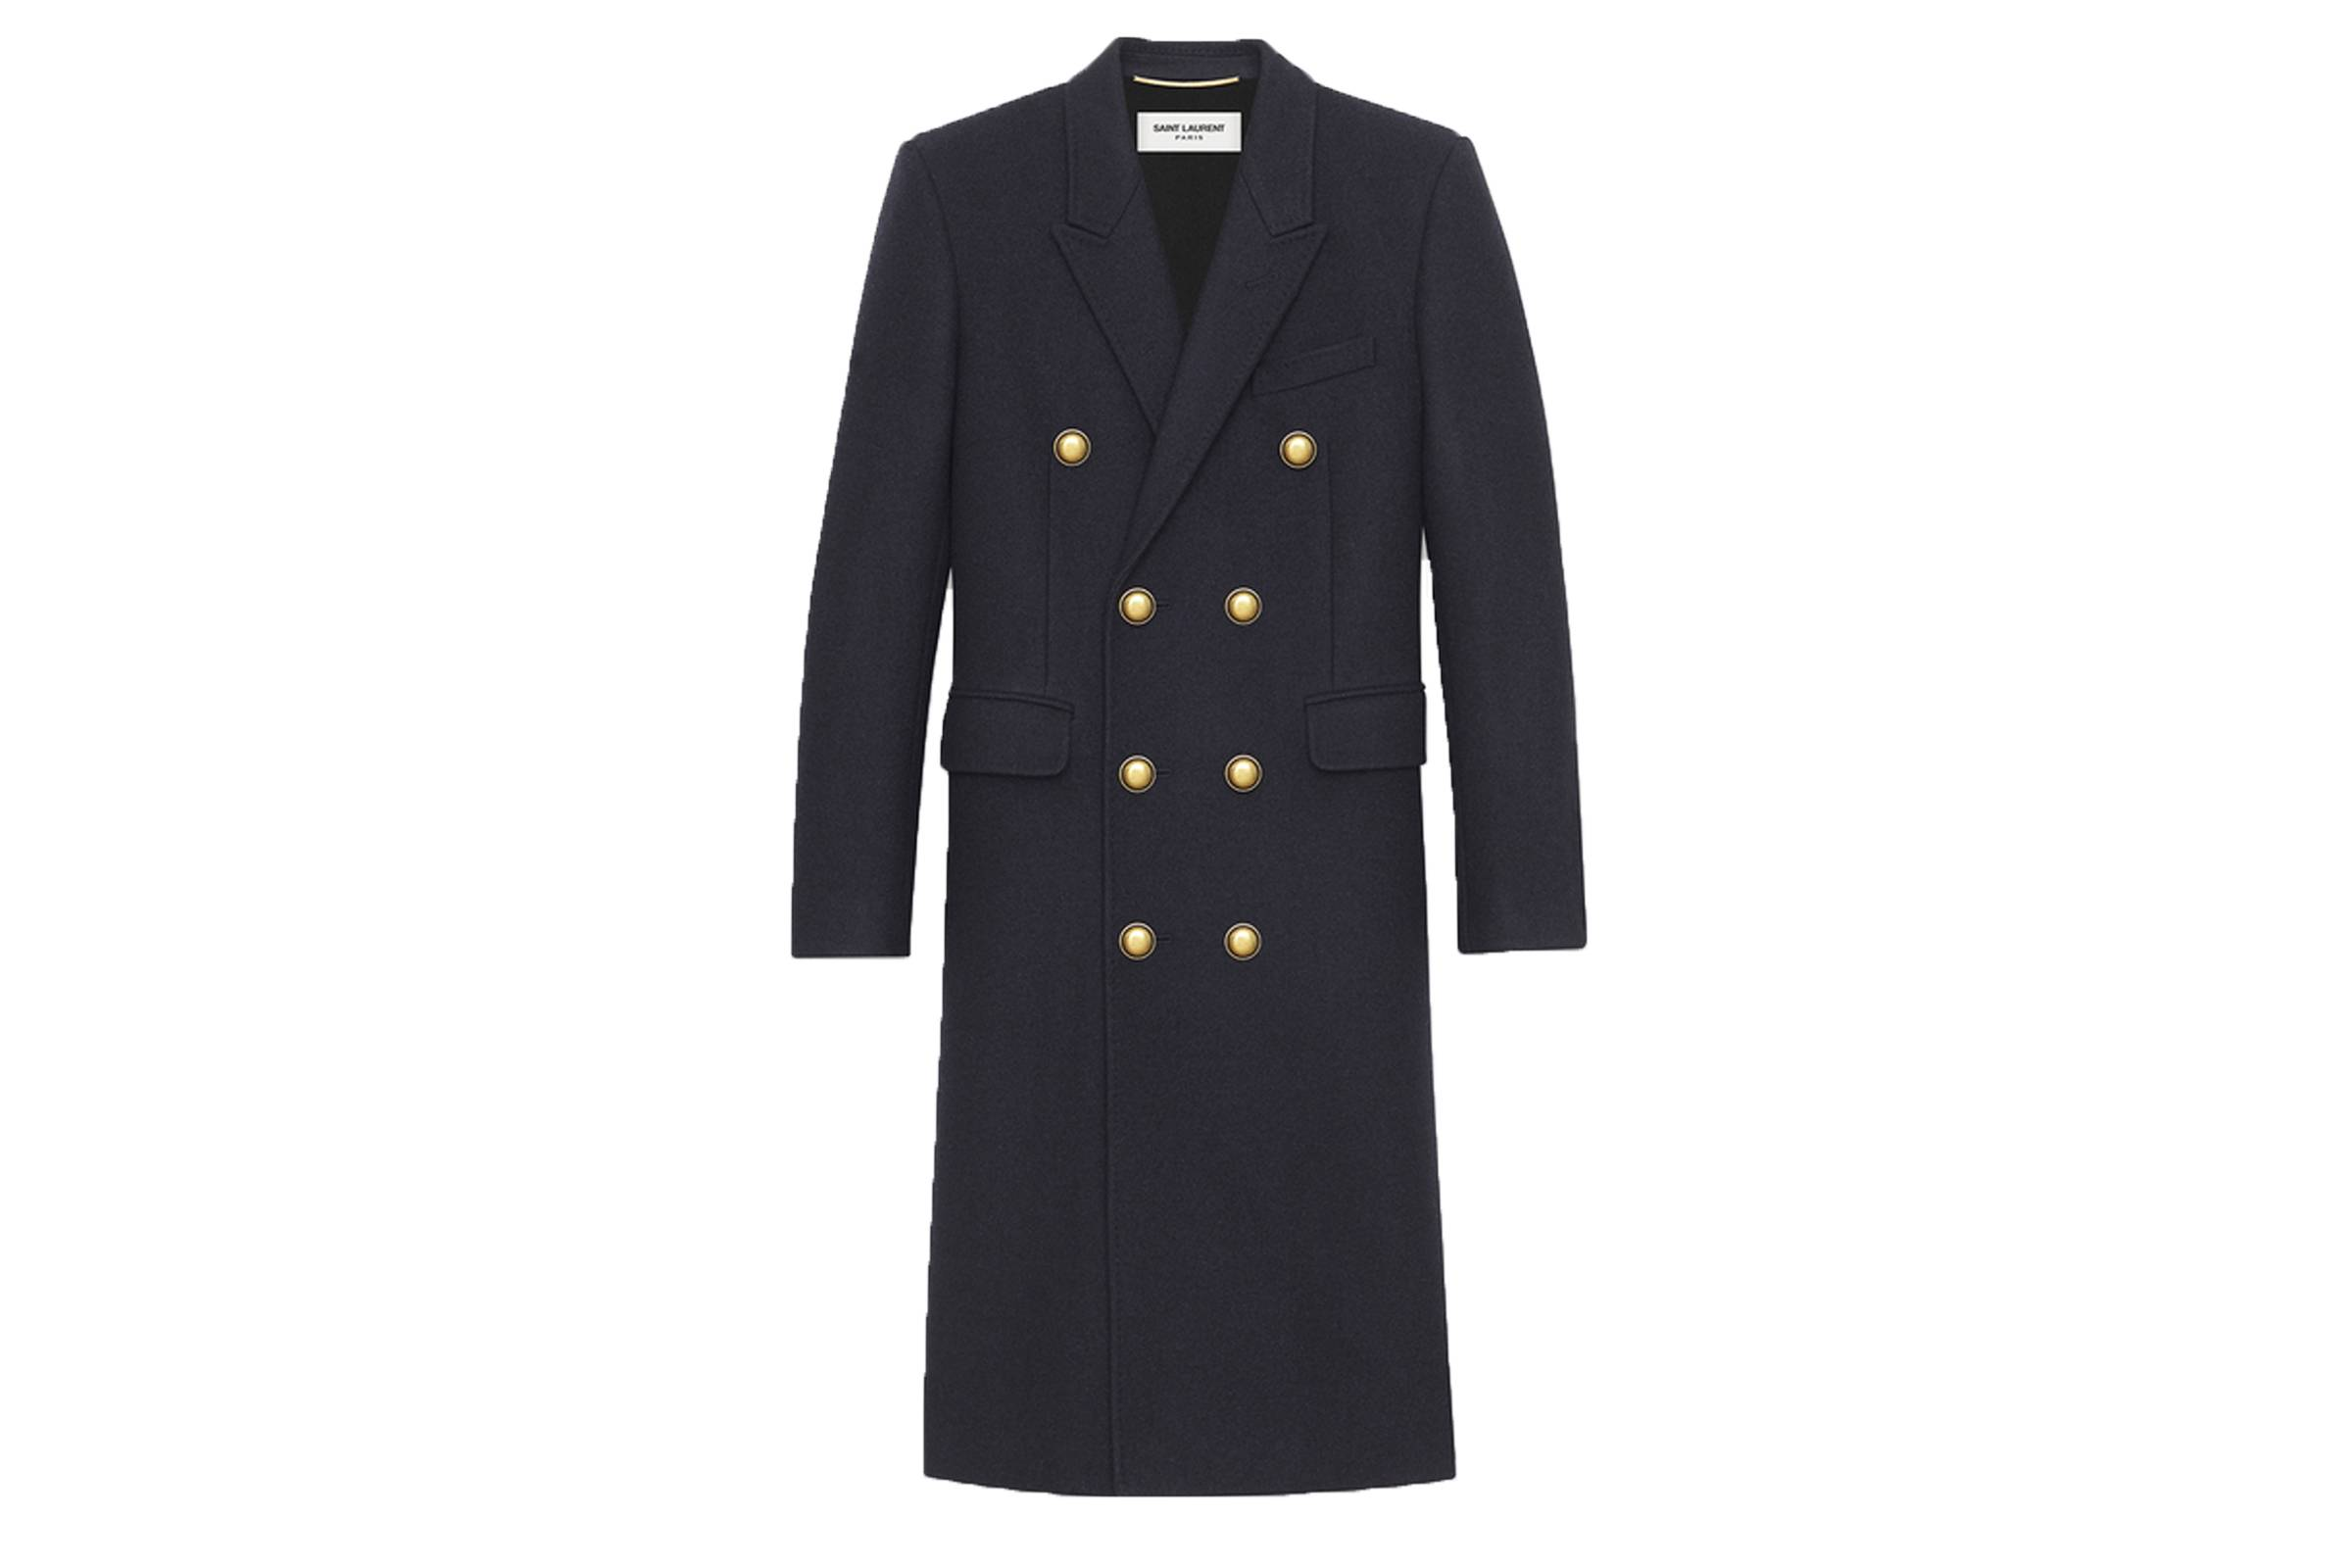 Saint Laurent Paris Allure Officer Coat